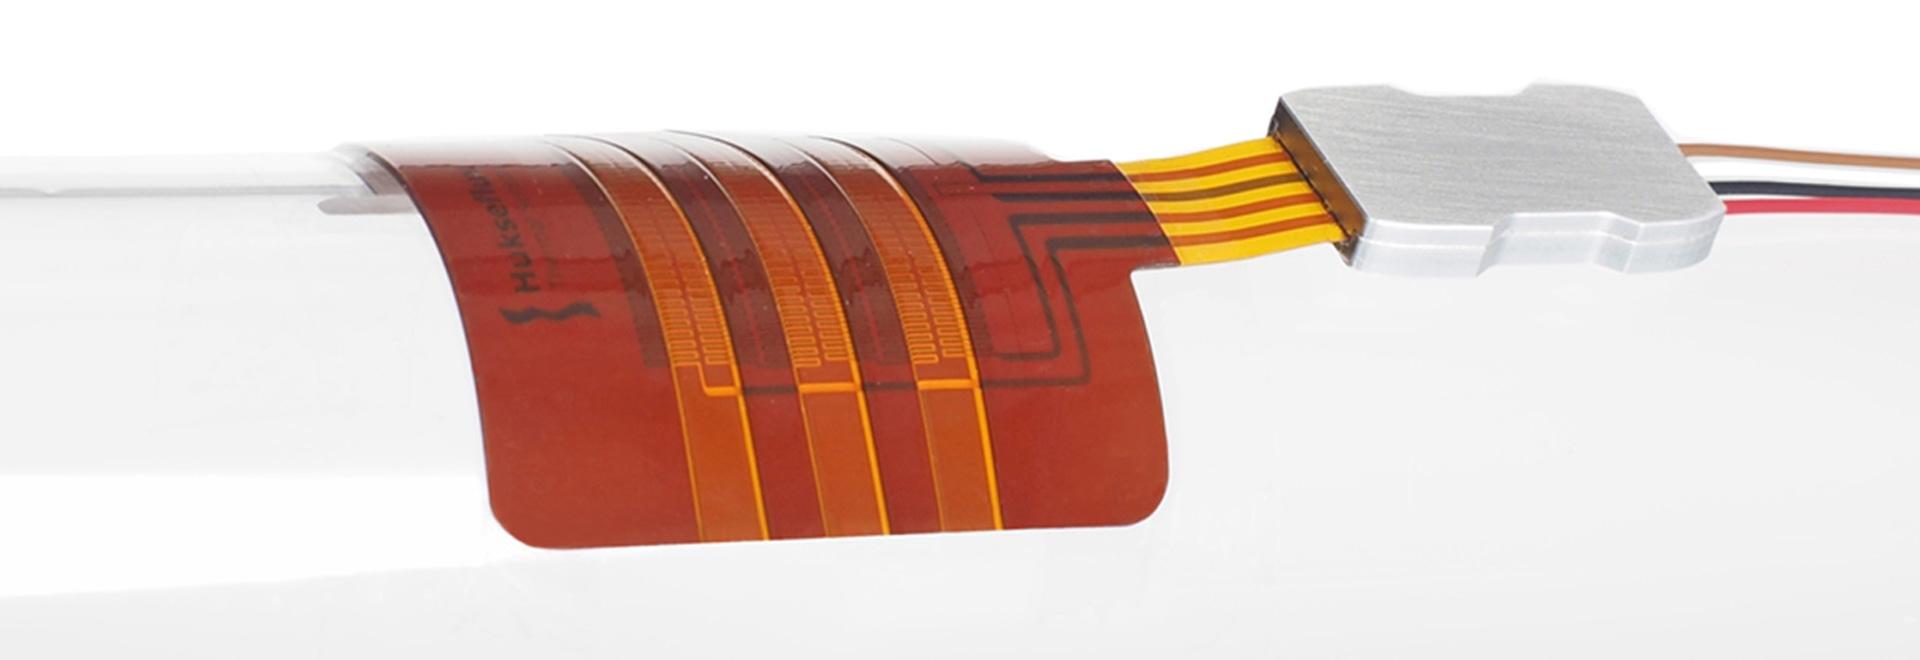 Sensor del flujo de calor de la hoja FHF01